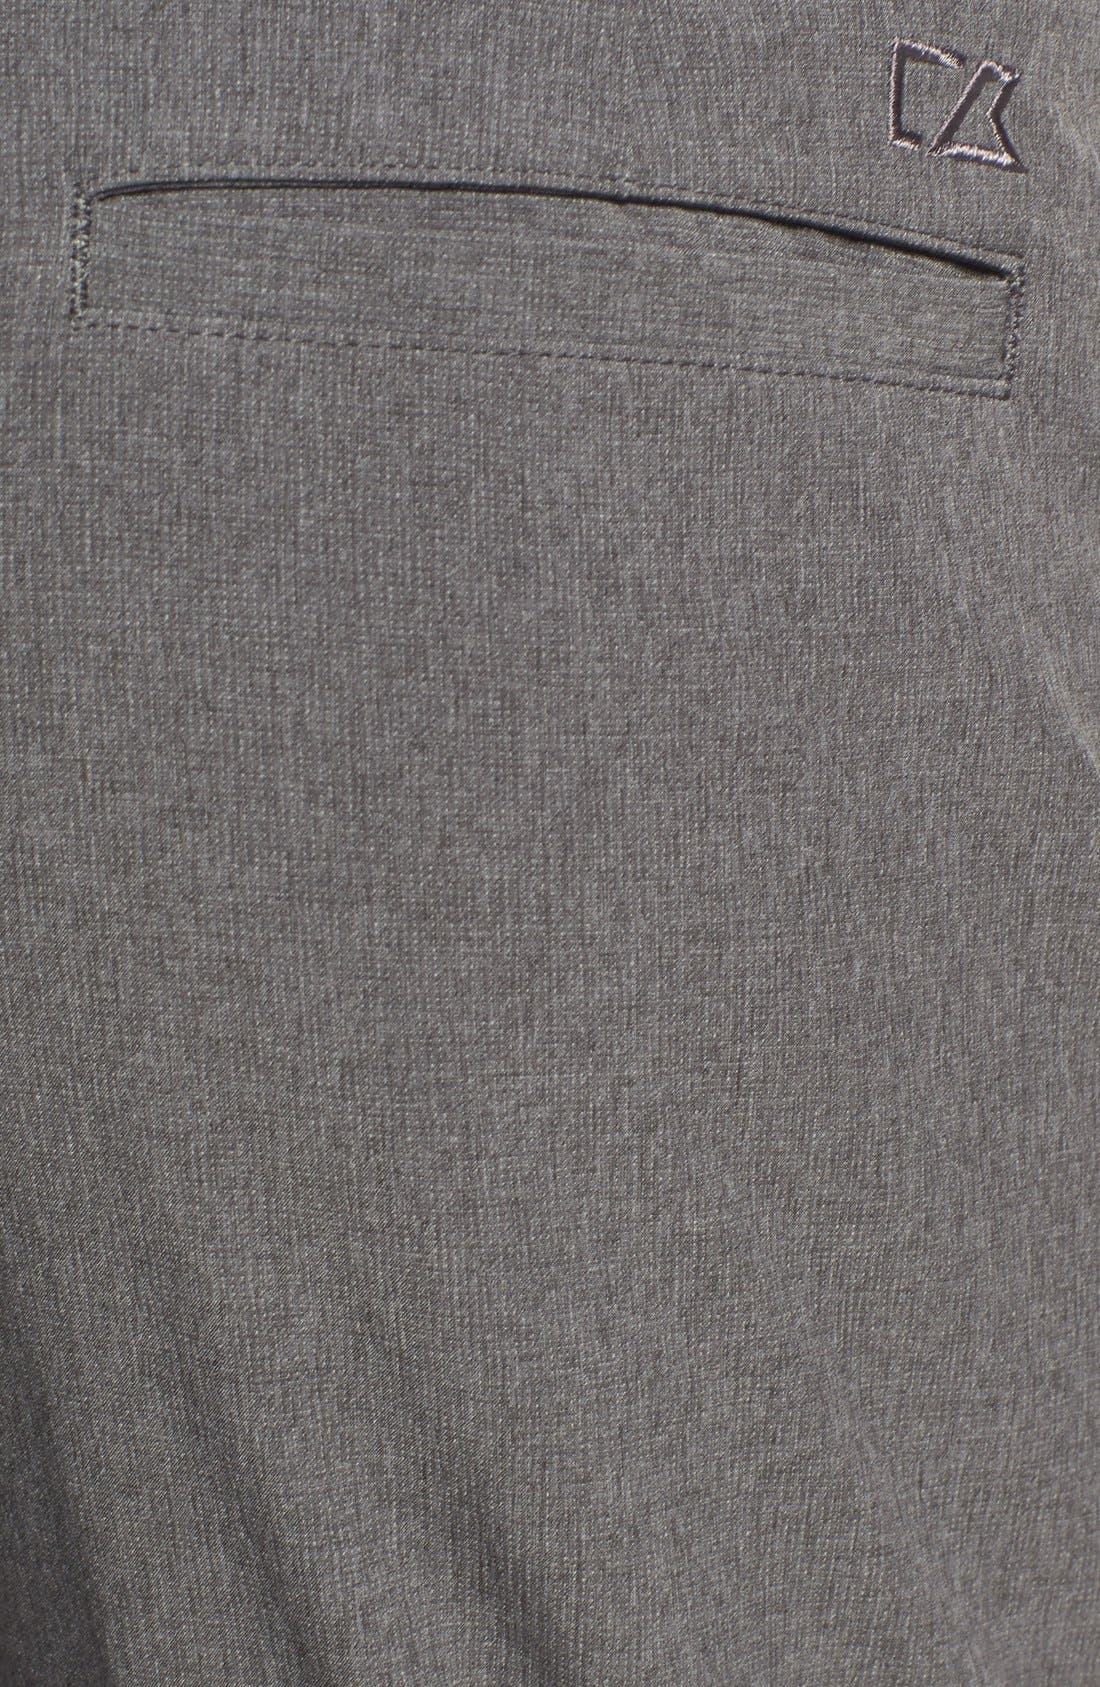 CUTTER & BUCK,                             'Bainbridge' DryTec Flat Front Pants,                             Alternate thumbnail 3, color,                             IRON GREY